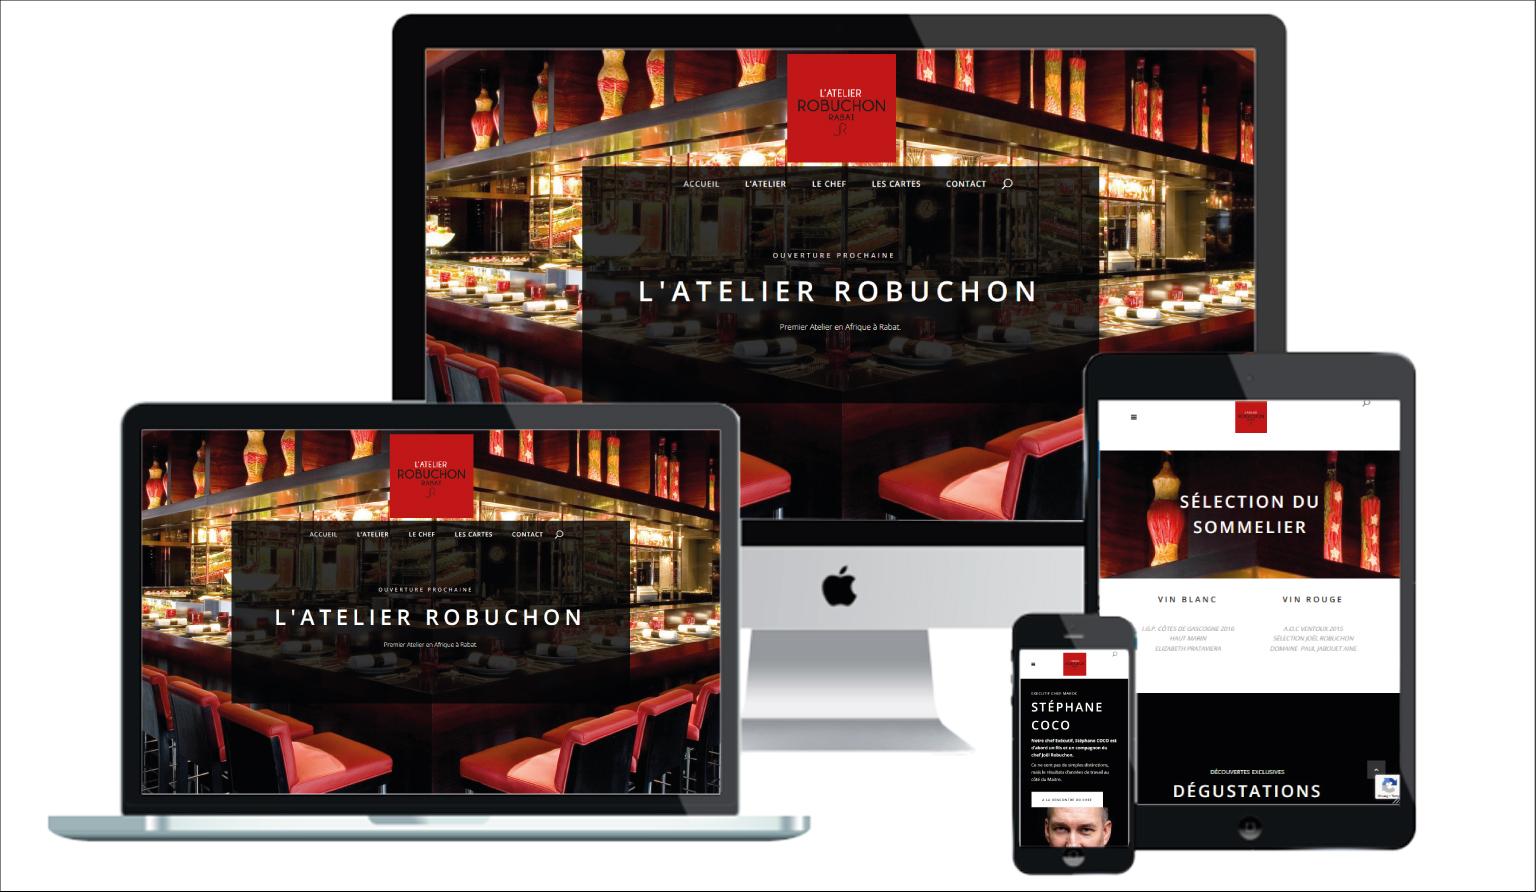 www.latelierrobuchonrabat.com